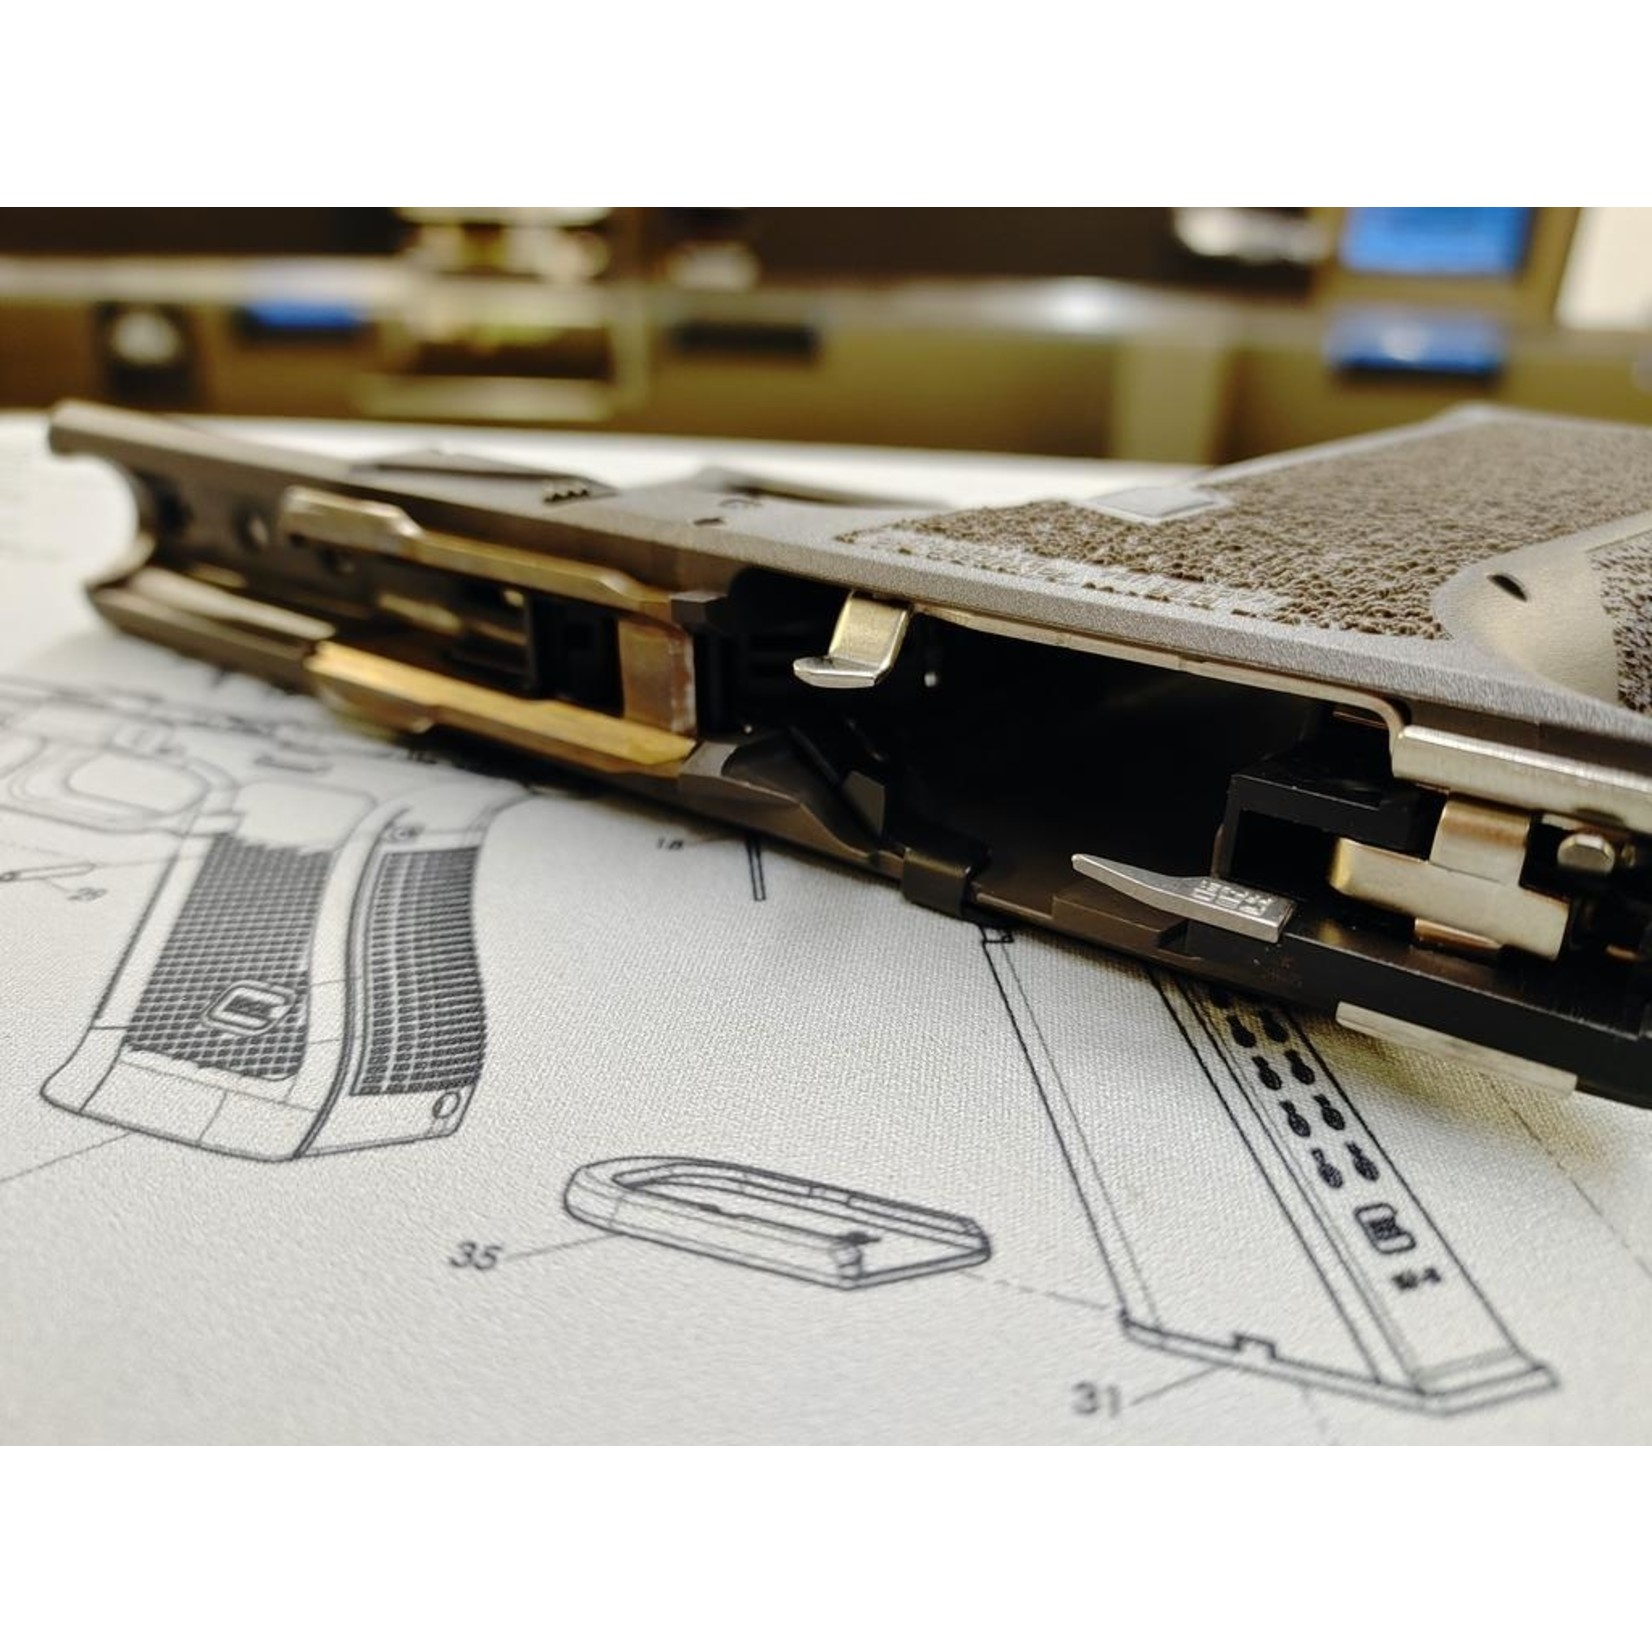 Poly80 PFS9 Serialized Standard Frame - Cobalt, Fully Assembled,  LPK installed